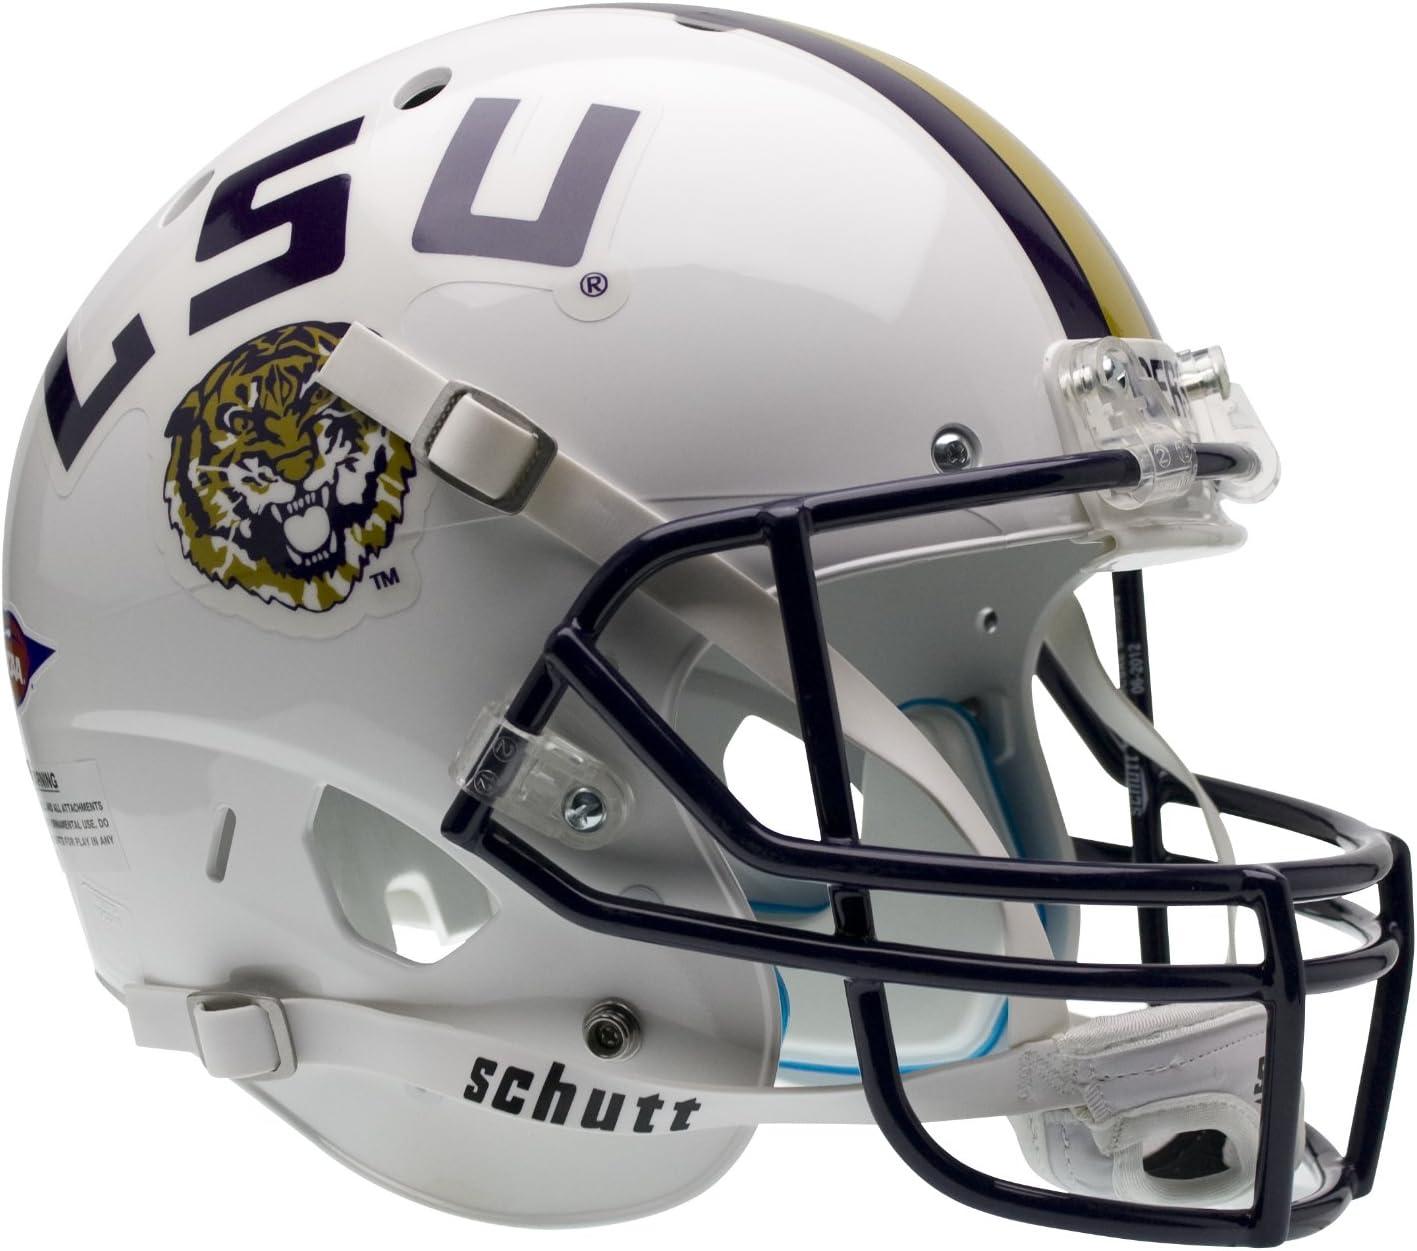 Schutt NCAA Our Detroit Mall shop OFFers the best service LSU Tigers Replica Helmet Collectible